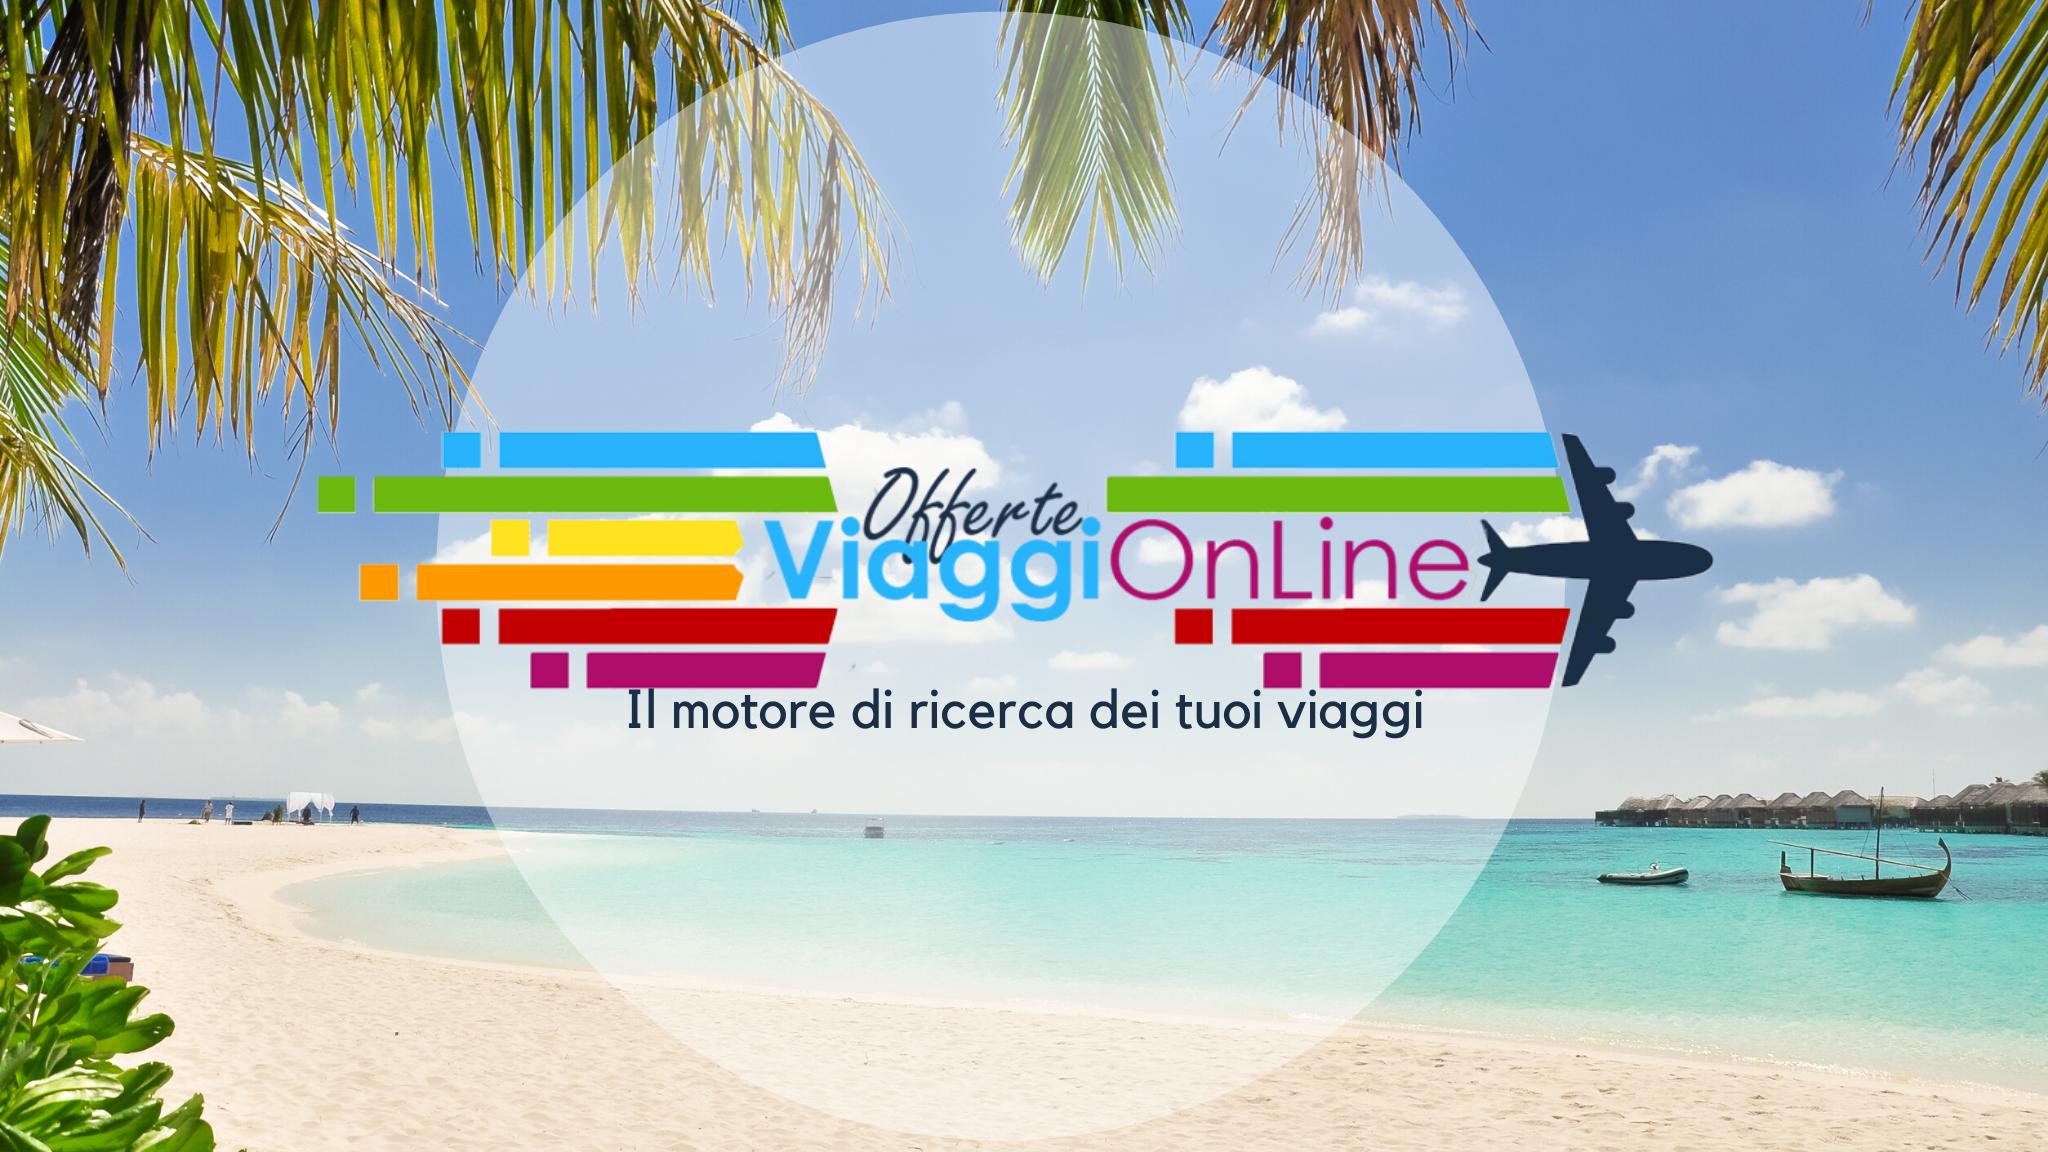 Offerte Viaggi Online Elodea Viaggi